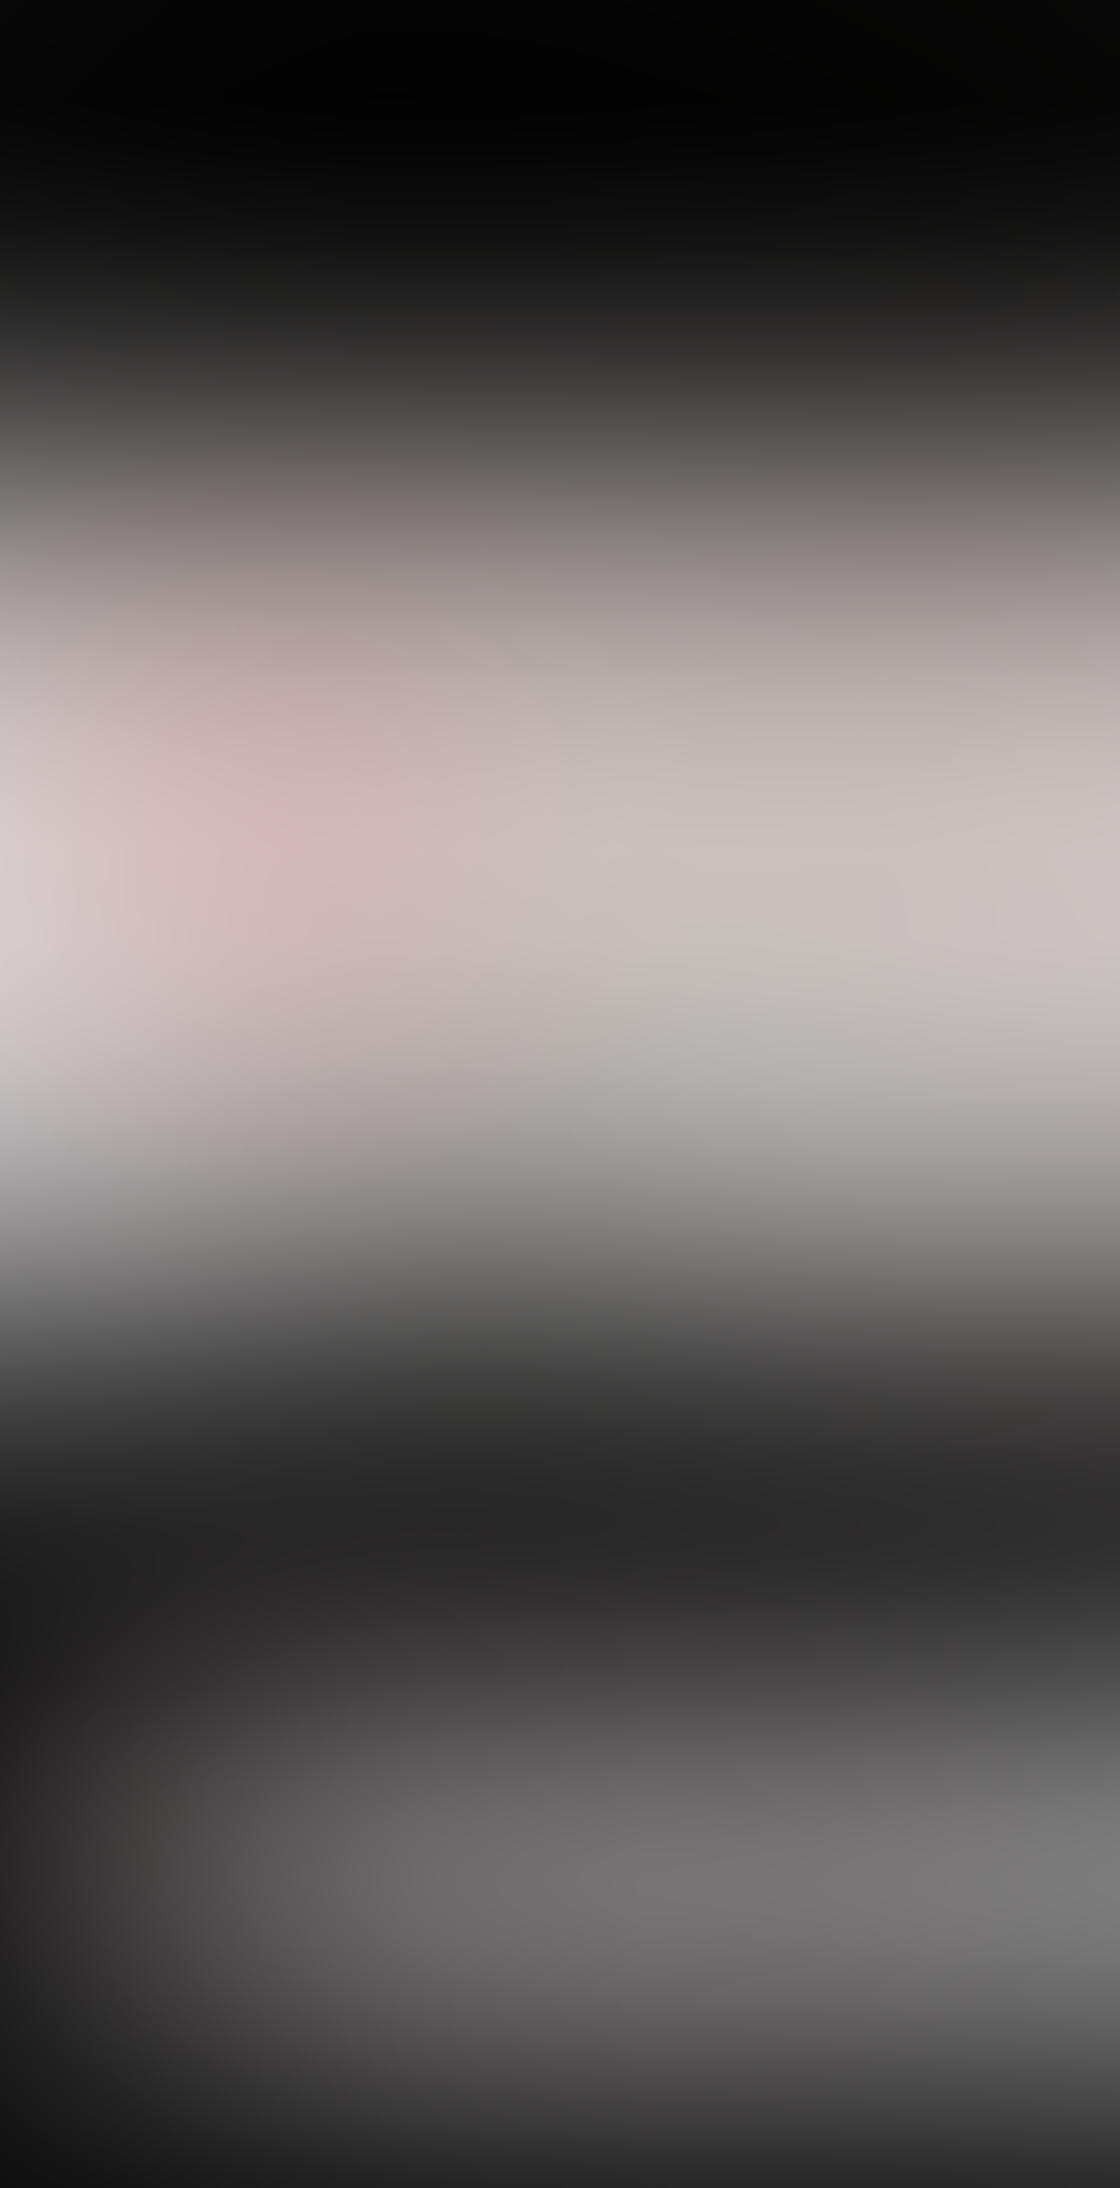 Vsco filters 4